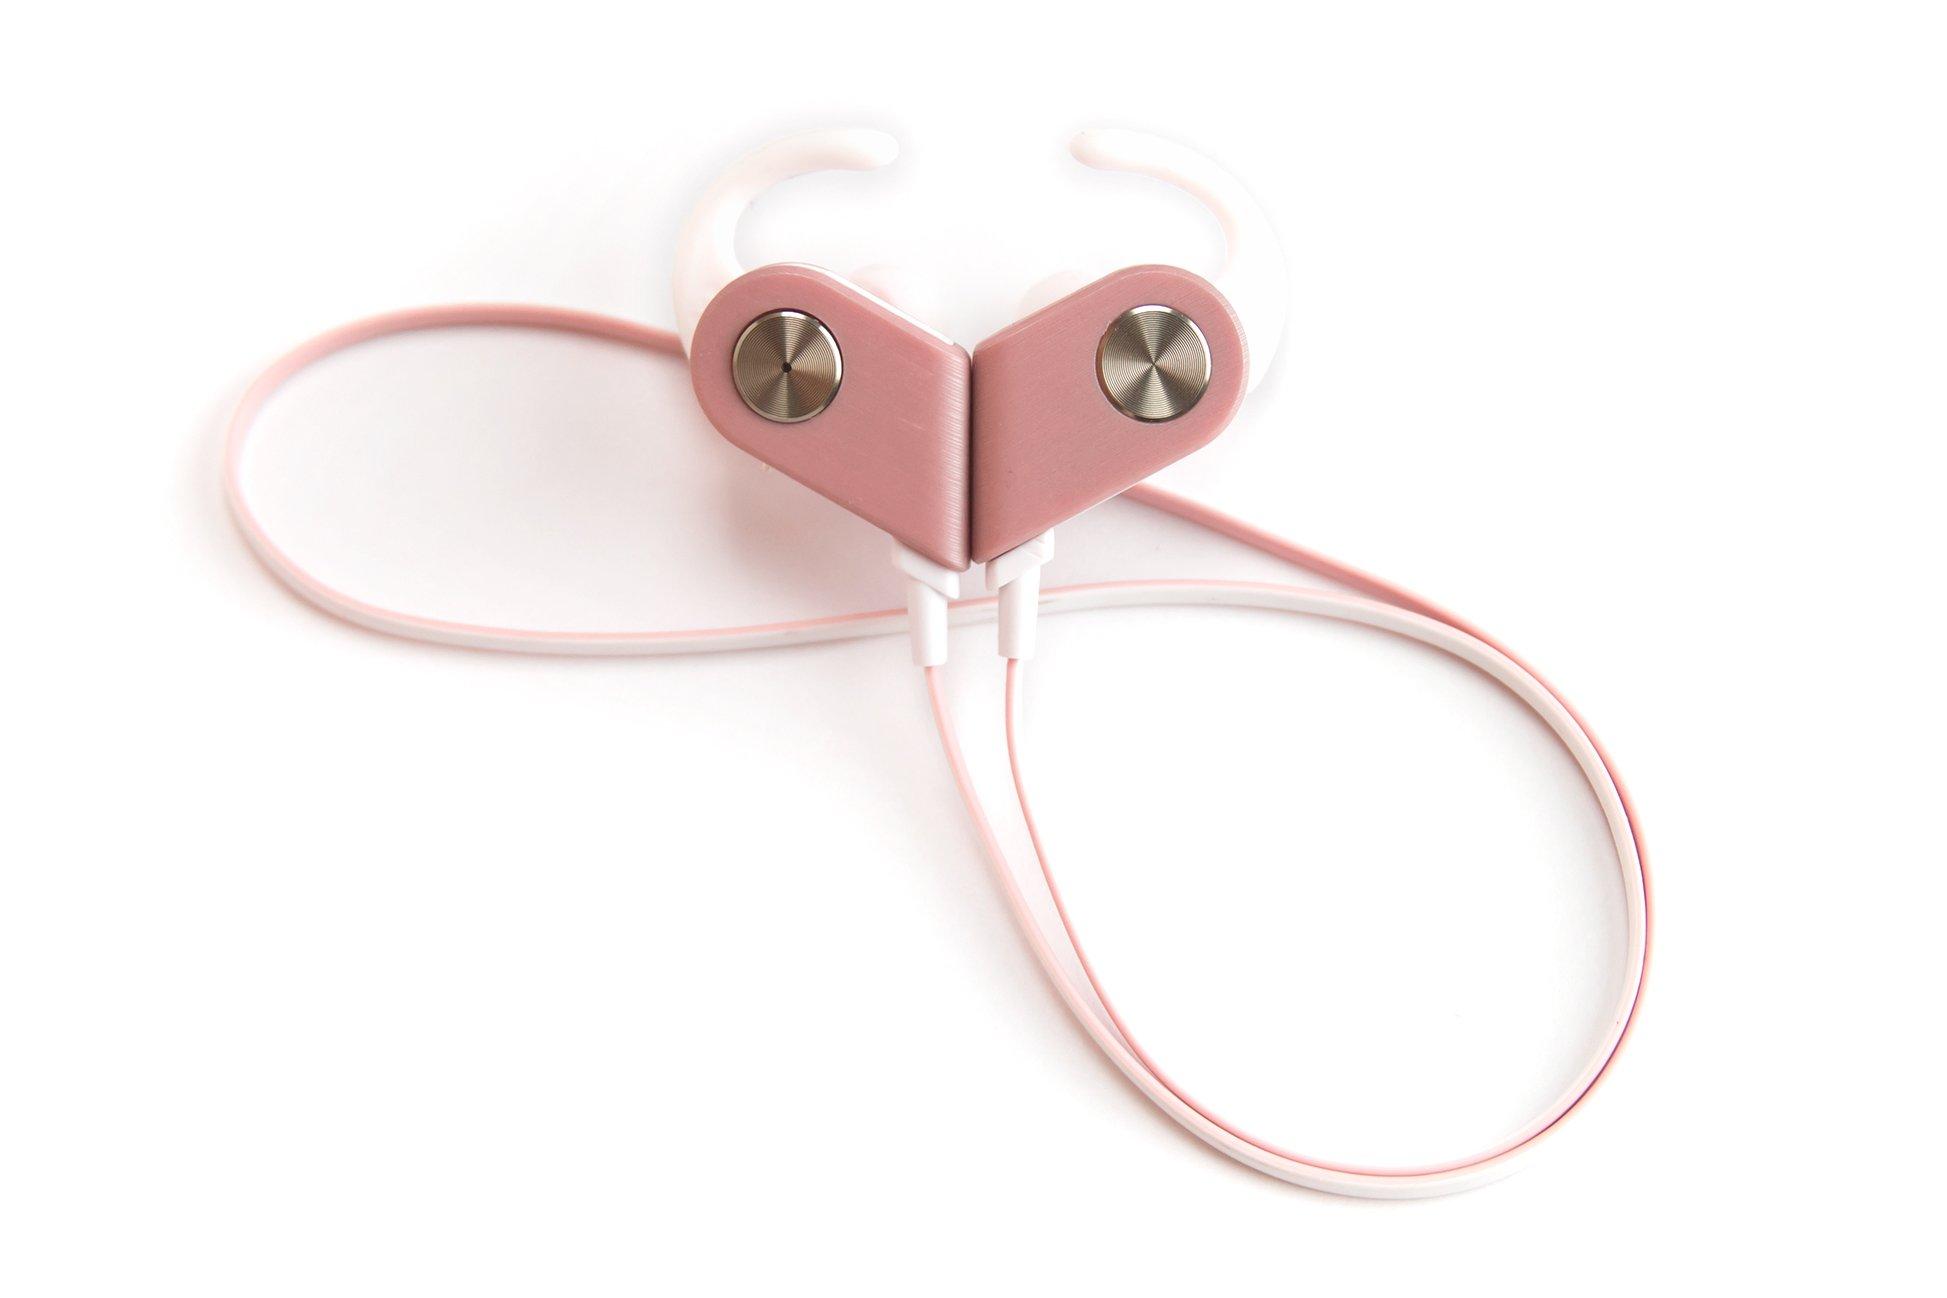 FRESHeBUDS Ultra - Wireless Bluetooth Headphones (Rose Gold)